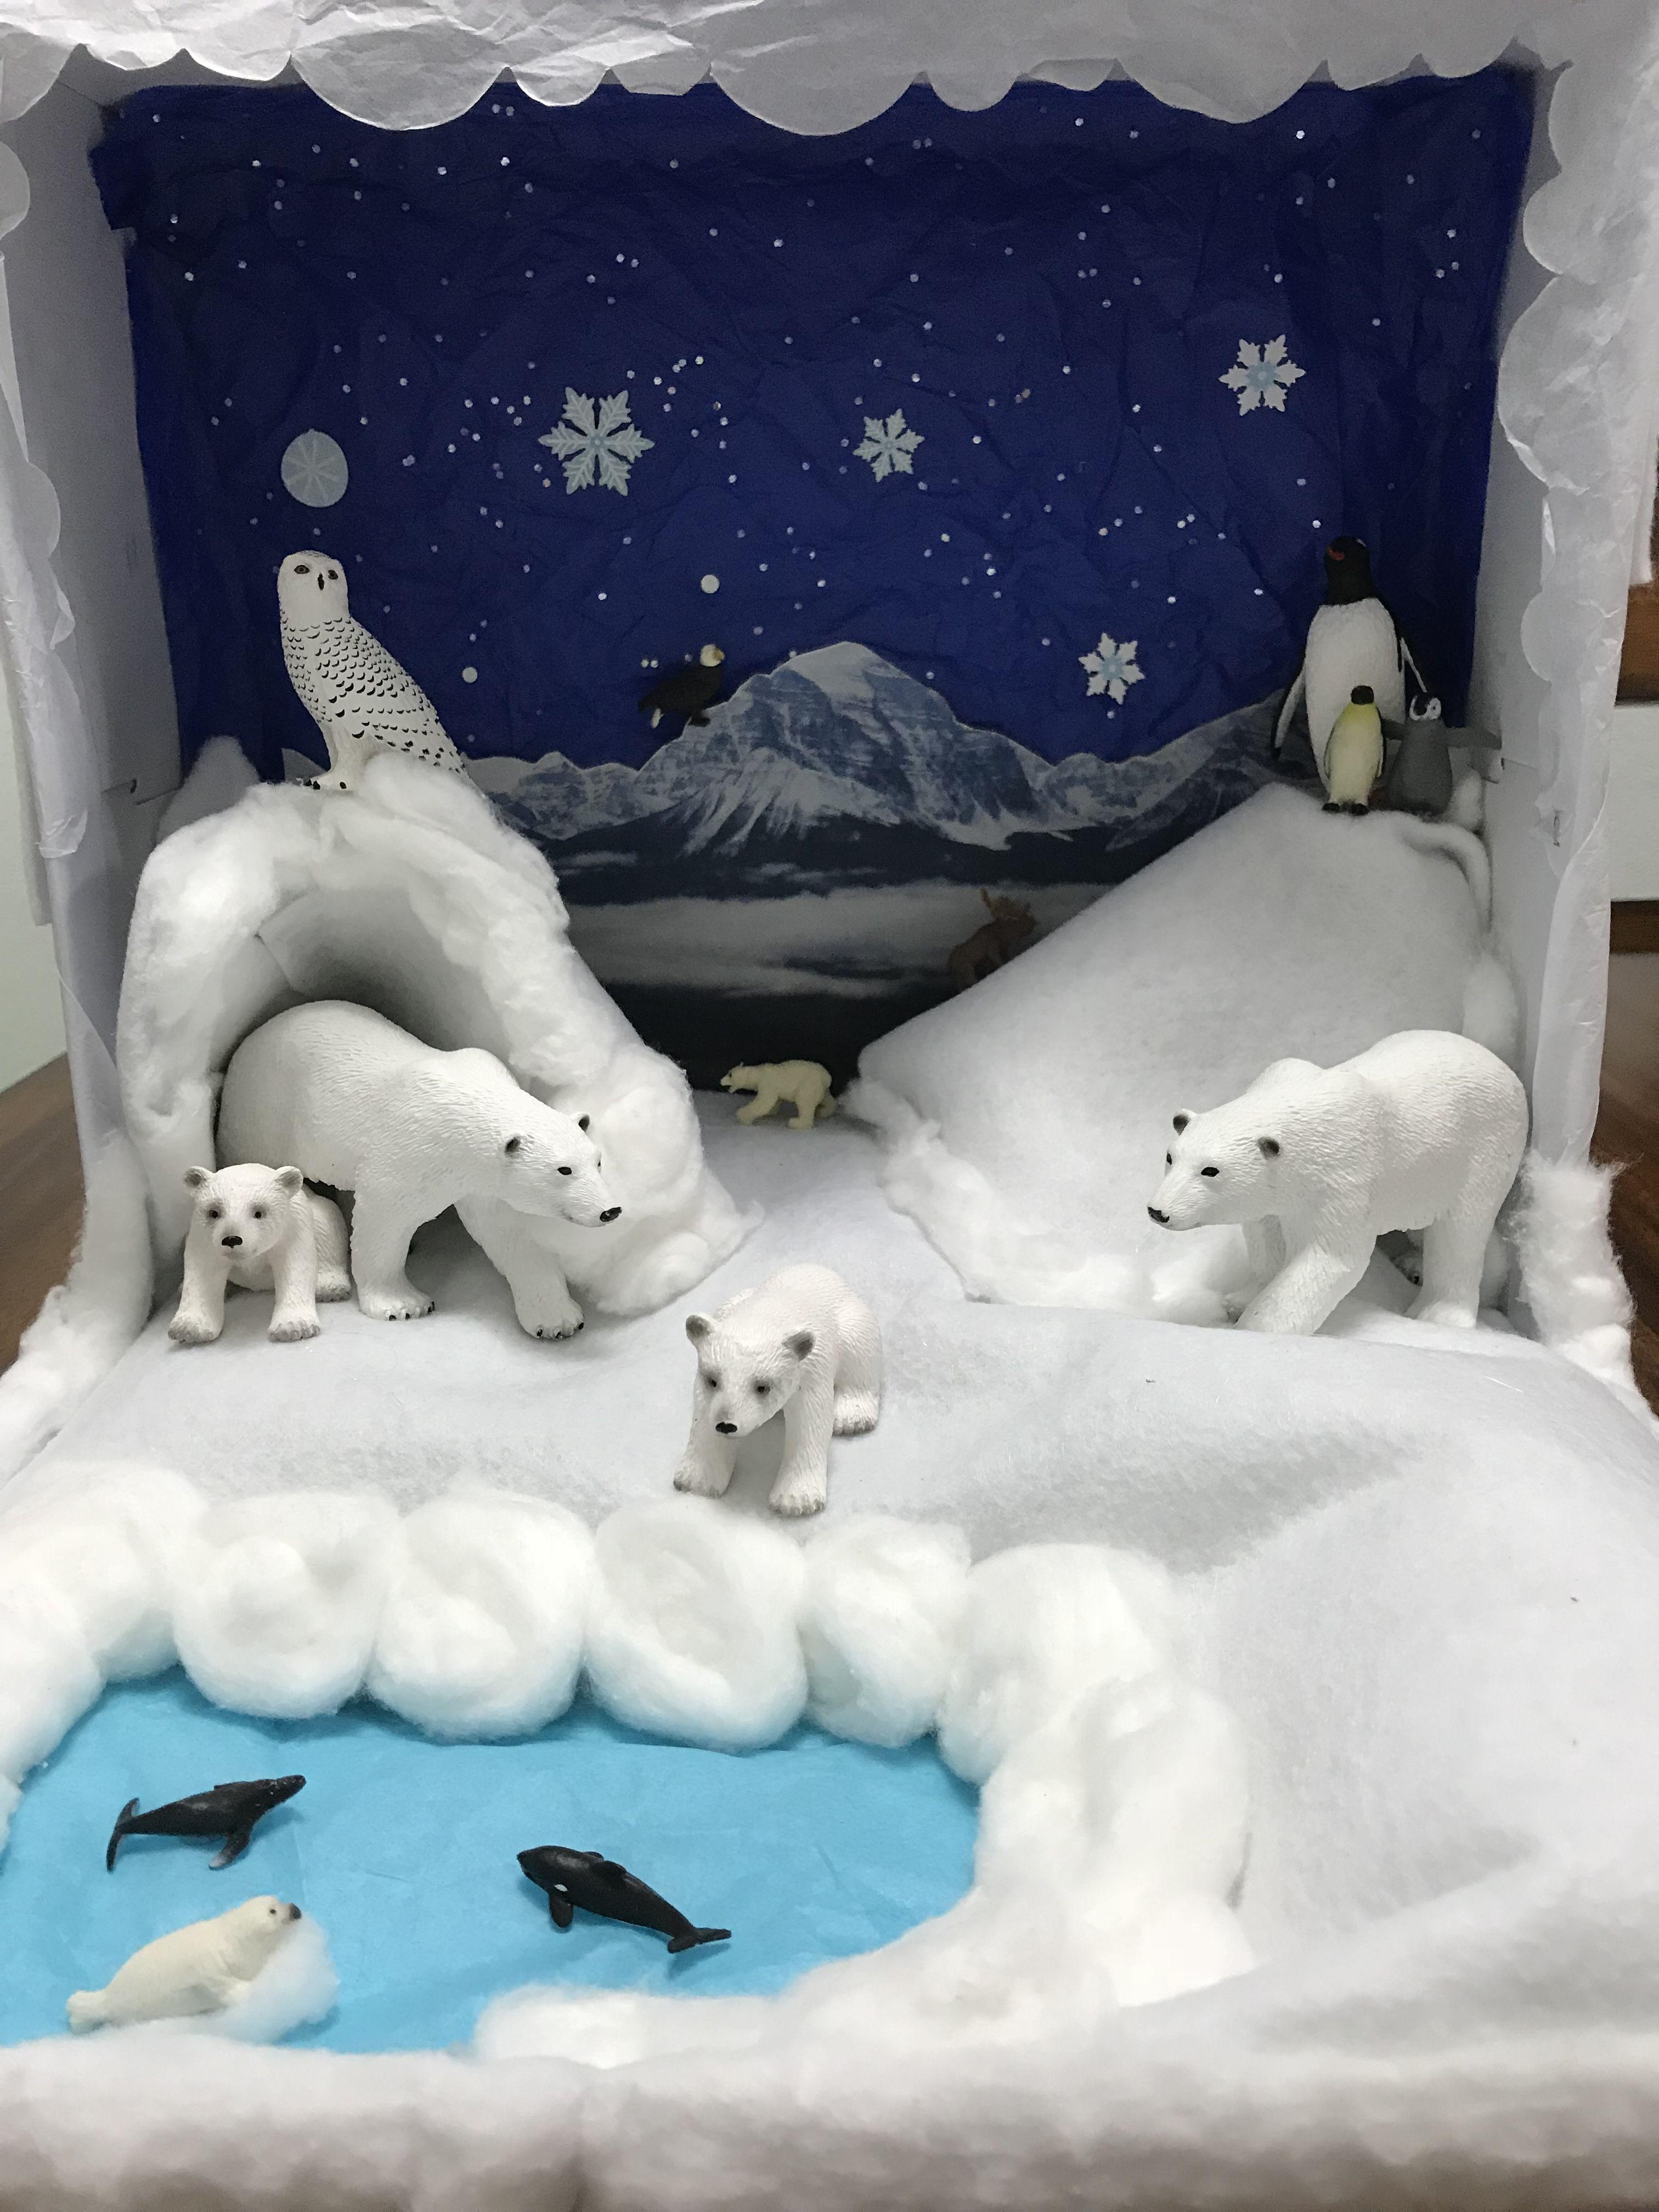 Polar Bear Diorama Kindergarten Haustier Projekt Dioramen Projekte Fur Kinder